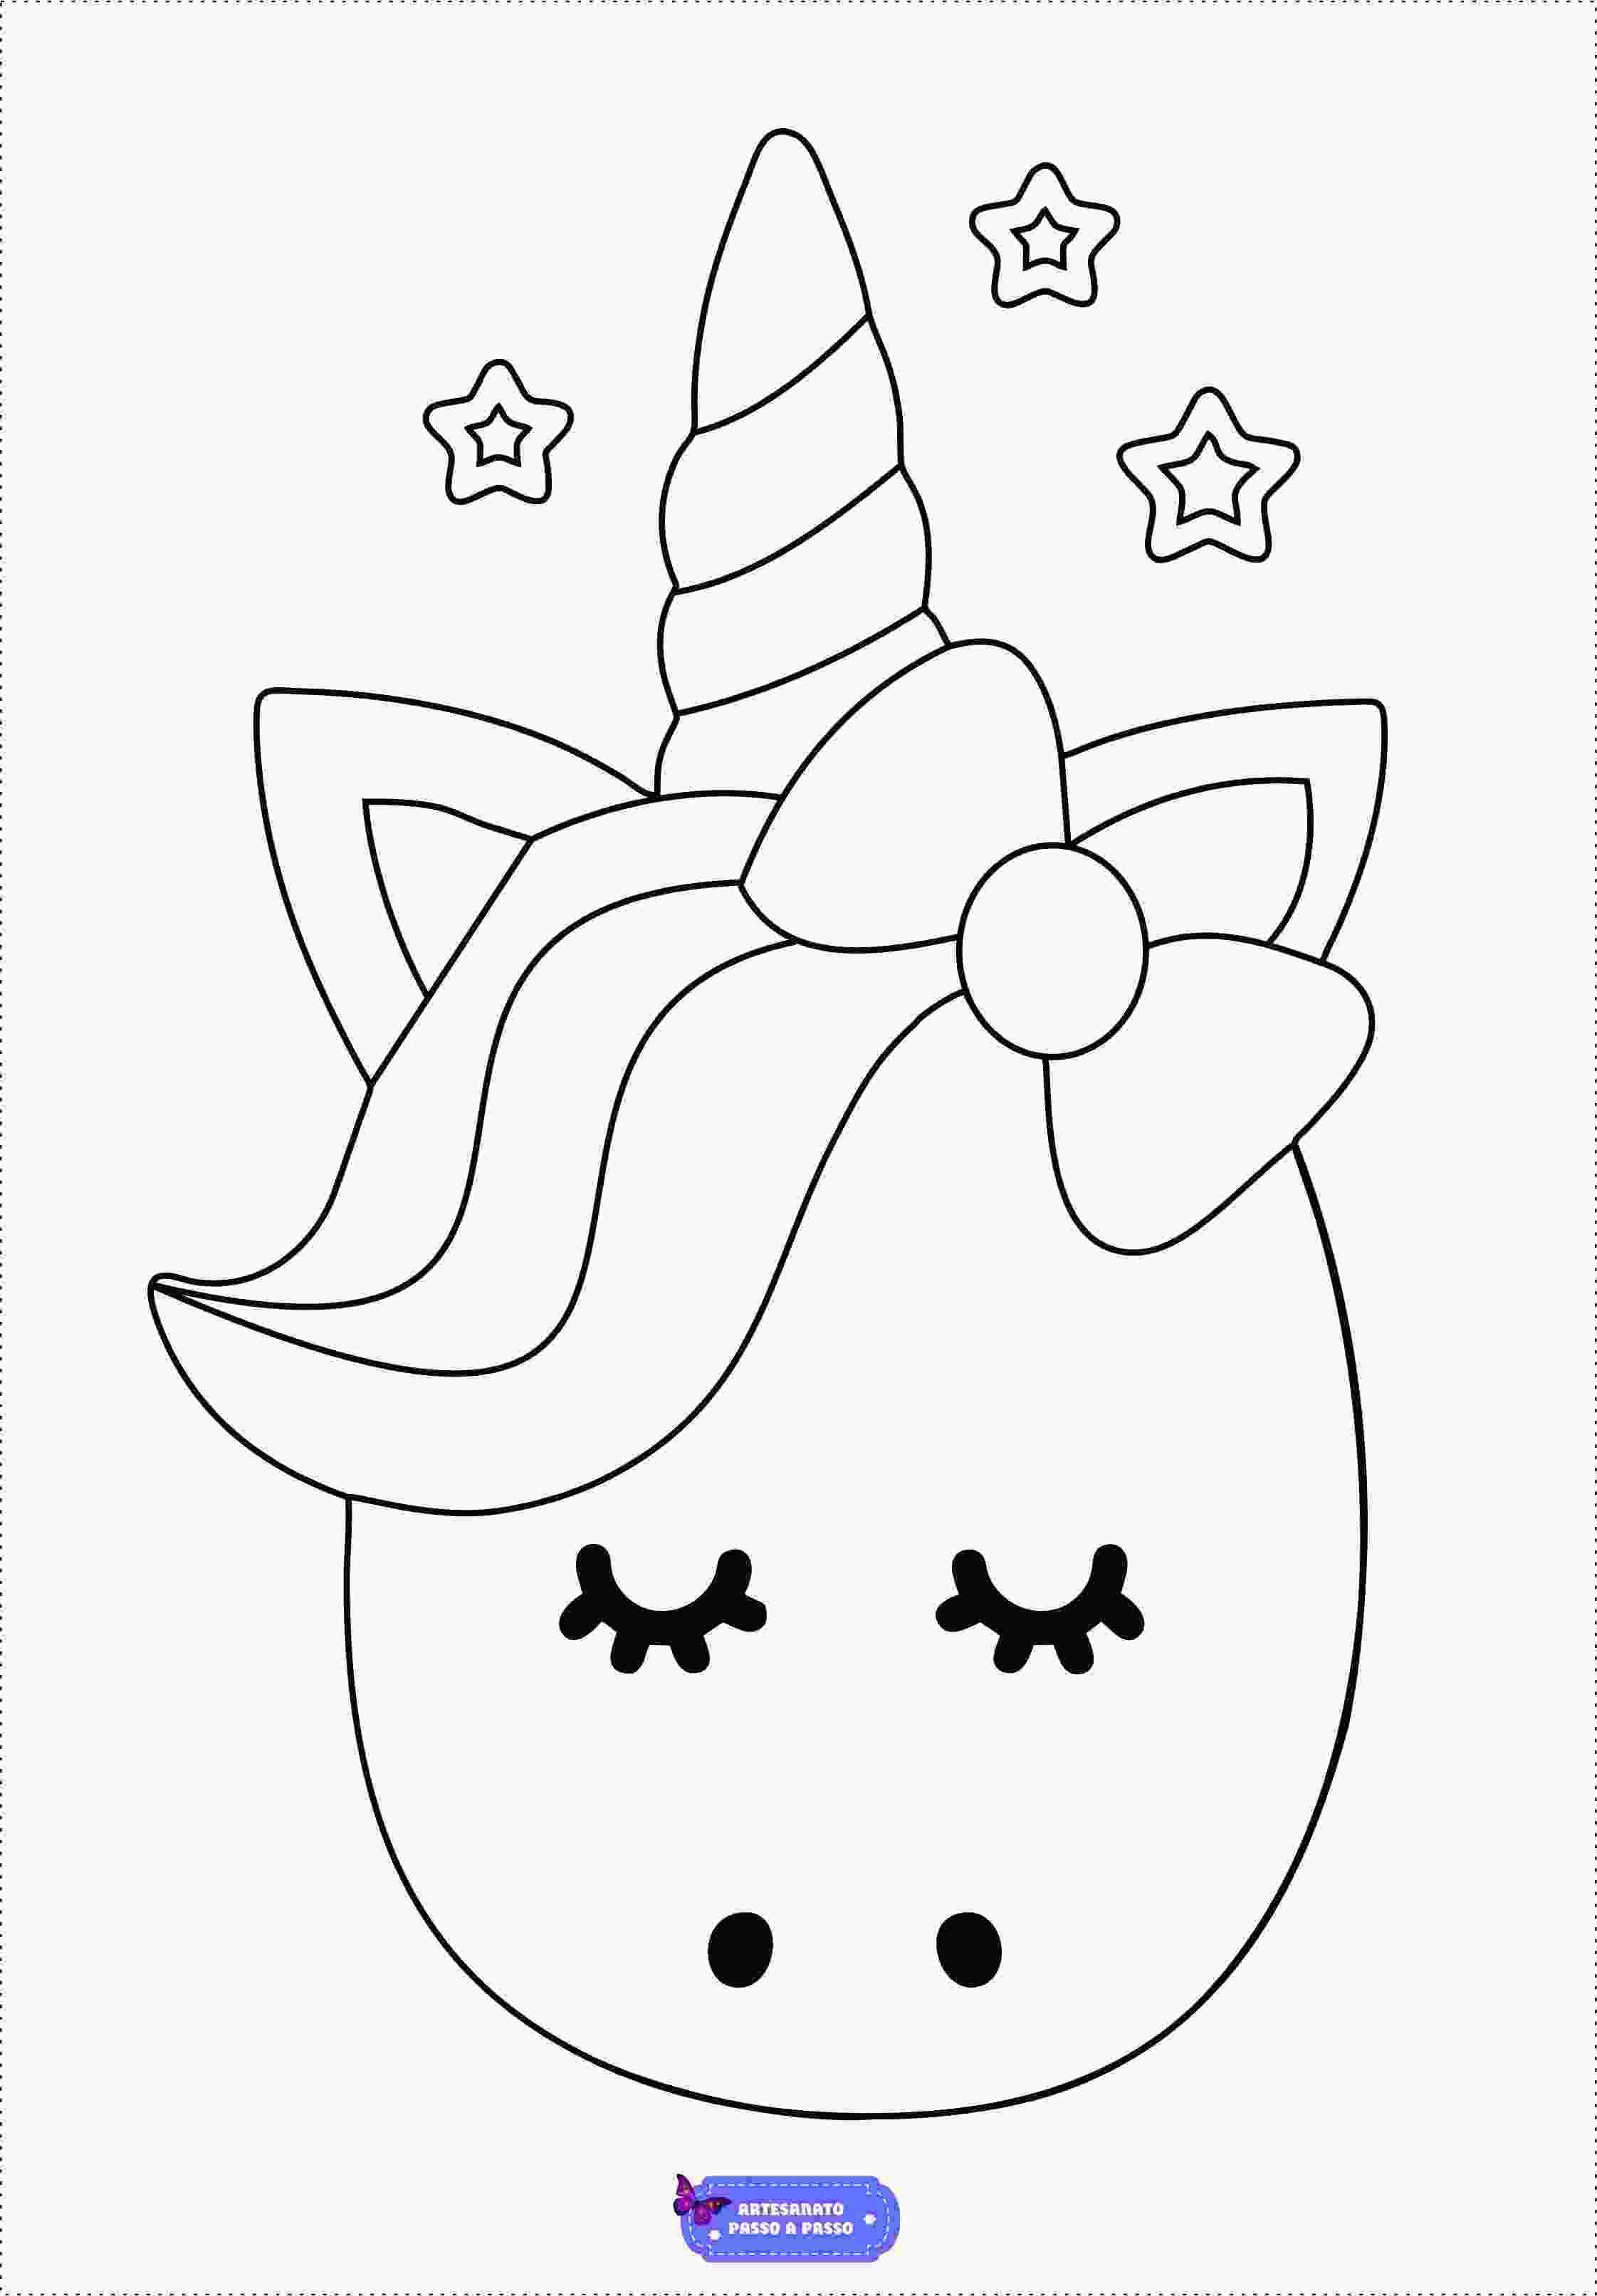 Desenhos De Unicornio Para Colorir Unicornio Para Colorir